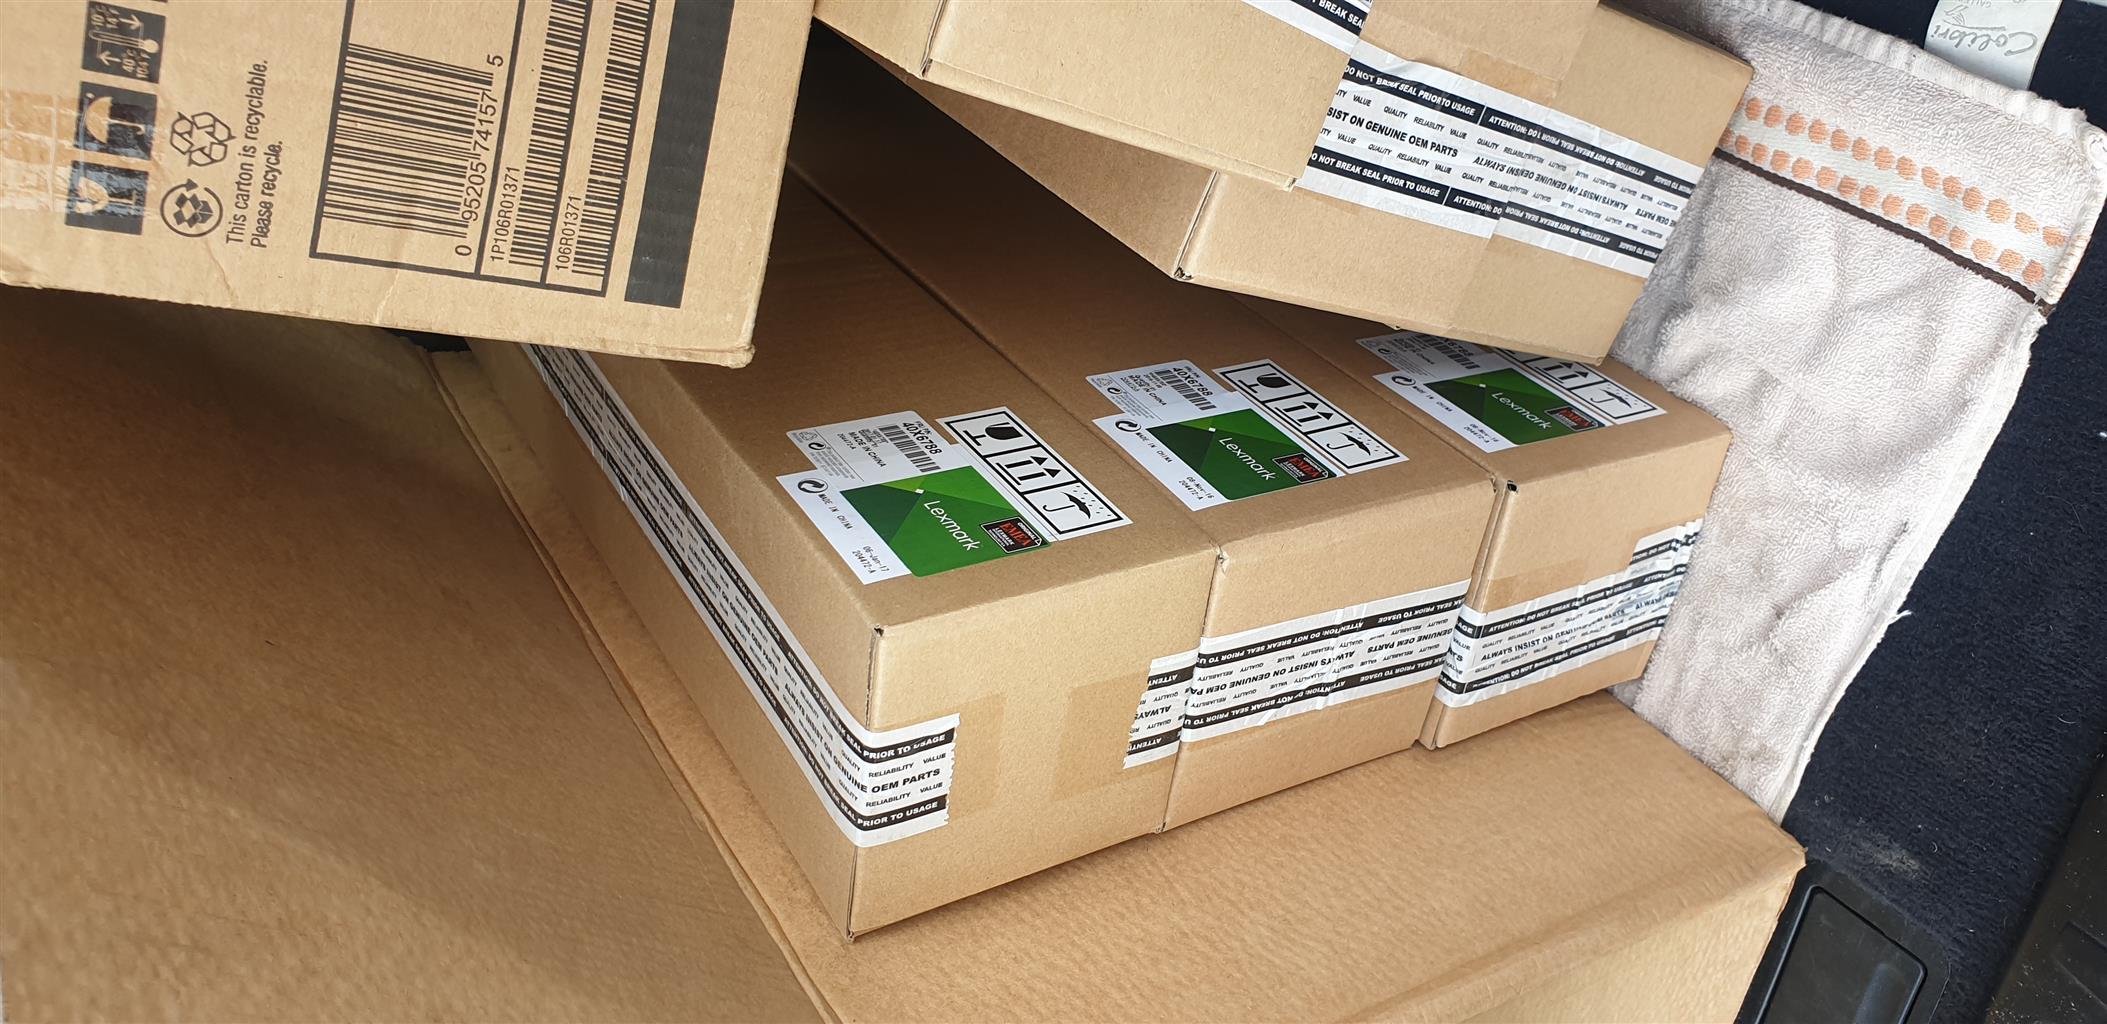 Print cartridges